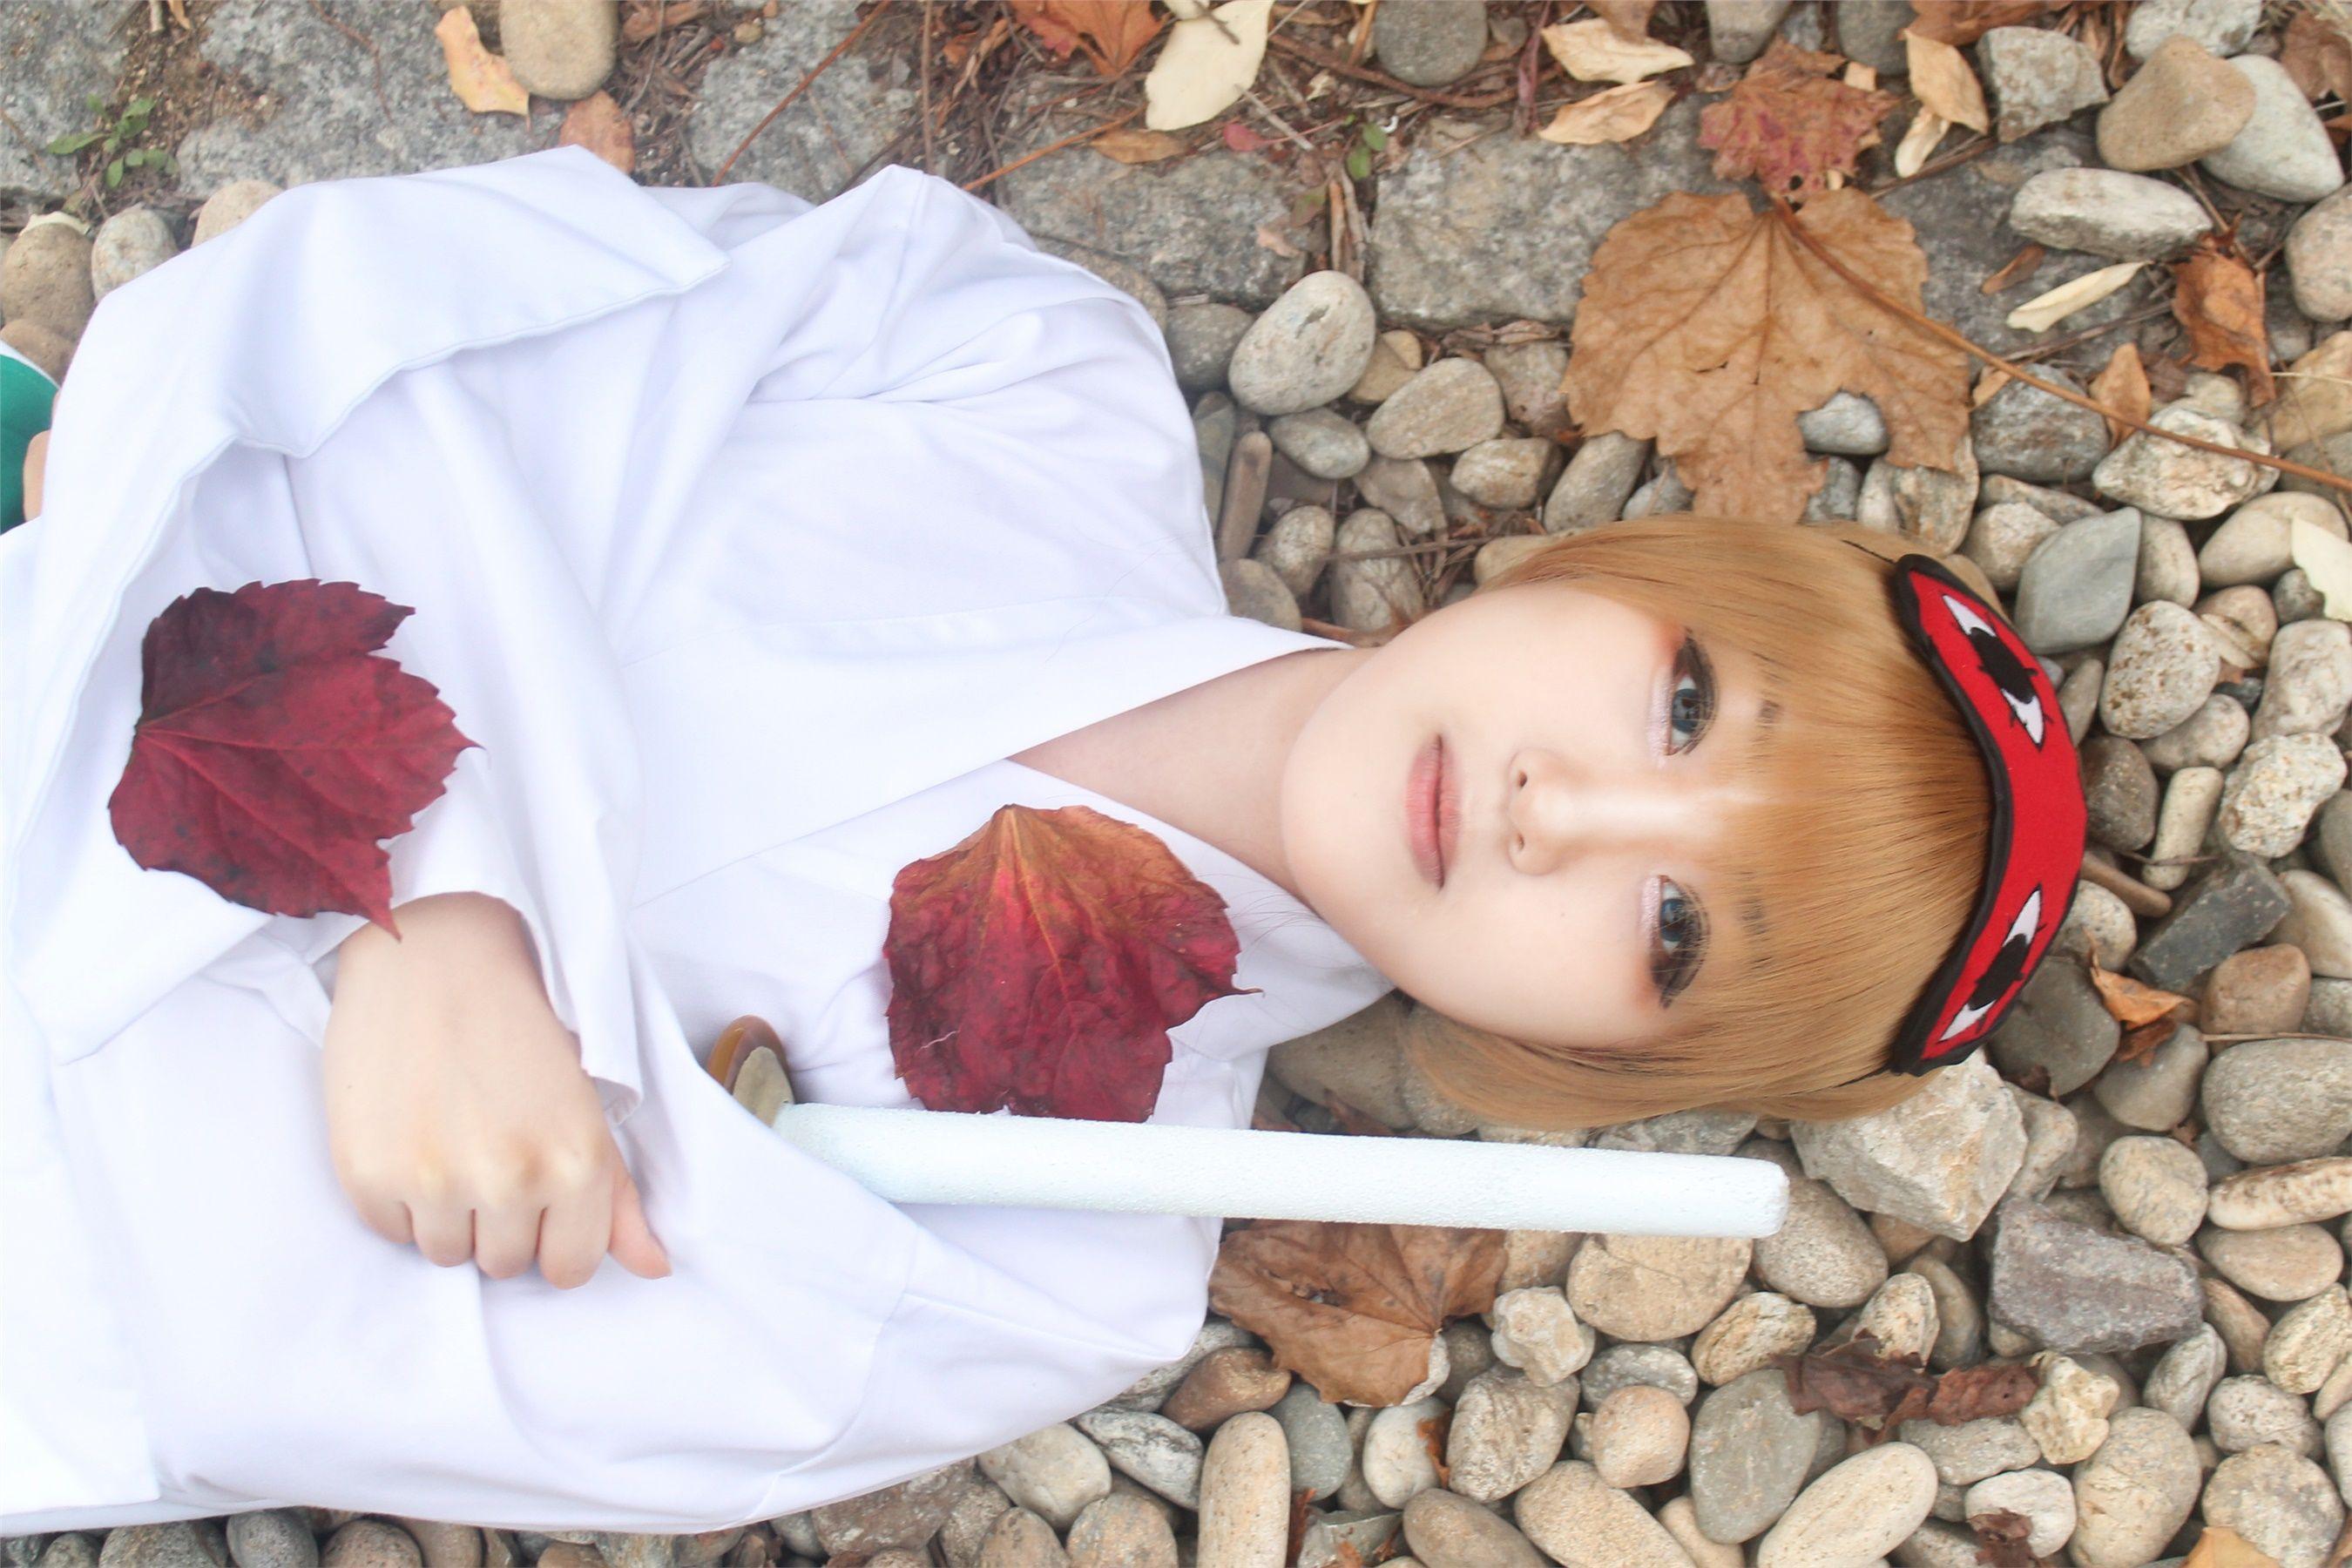 okita childhood - Hamto Sougo Okita Cosplay Photo